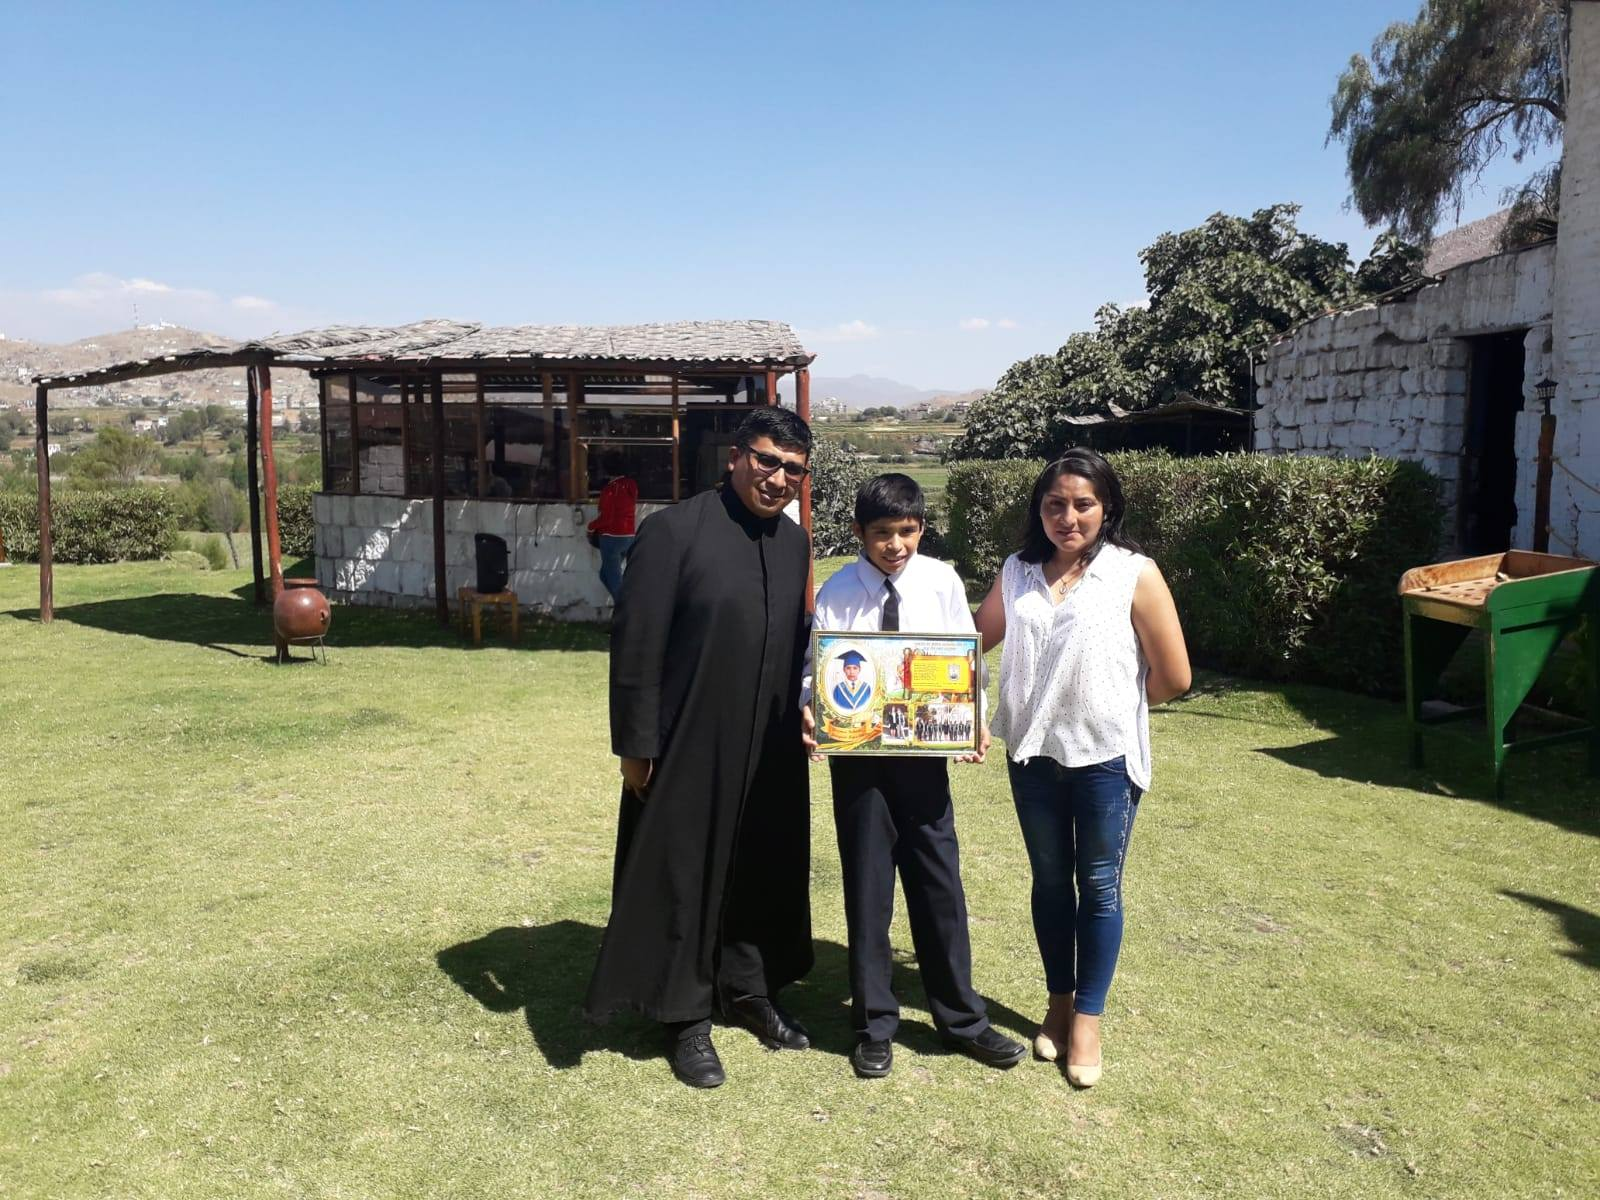 Fin de curso de Joaquín en el Hogar San Anibal en Perú